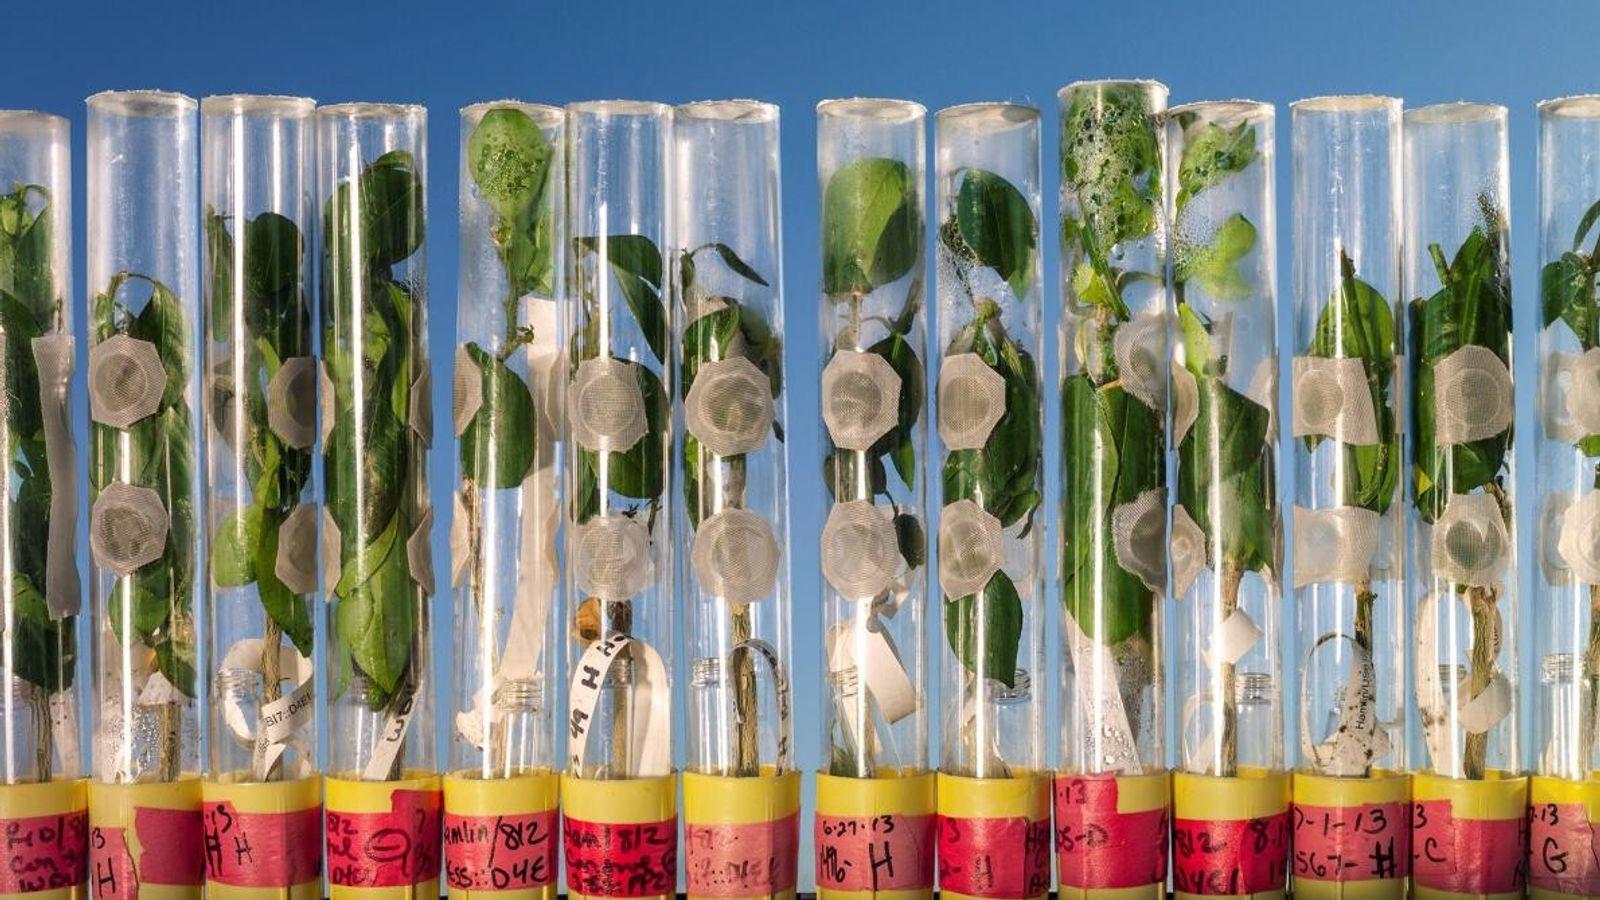 Naranjos modificados genéticamente